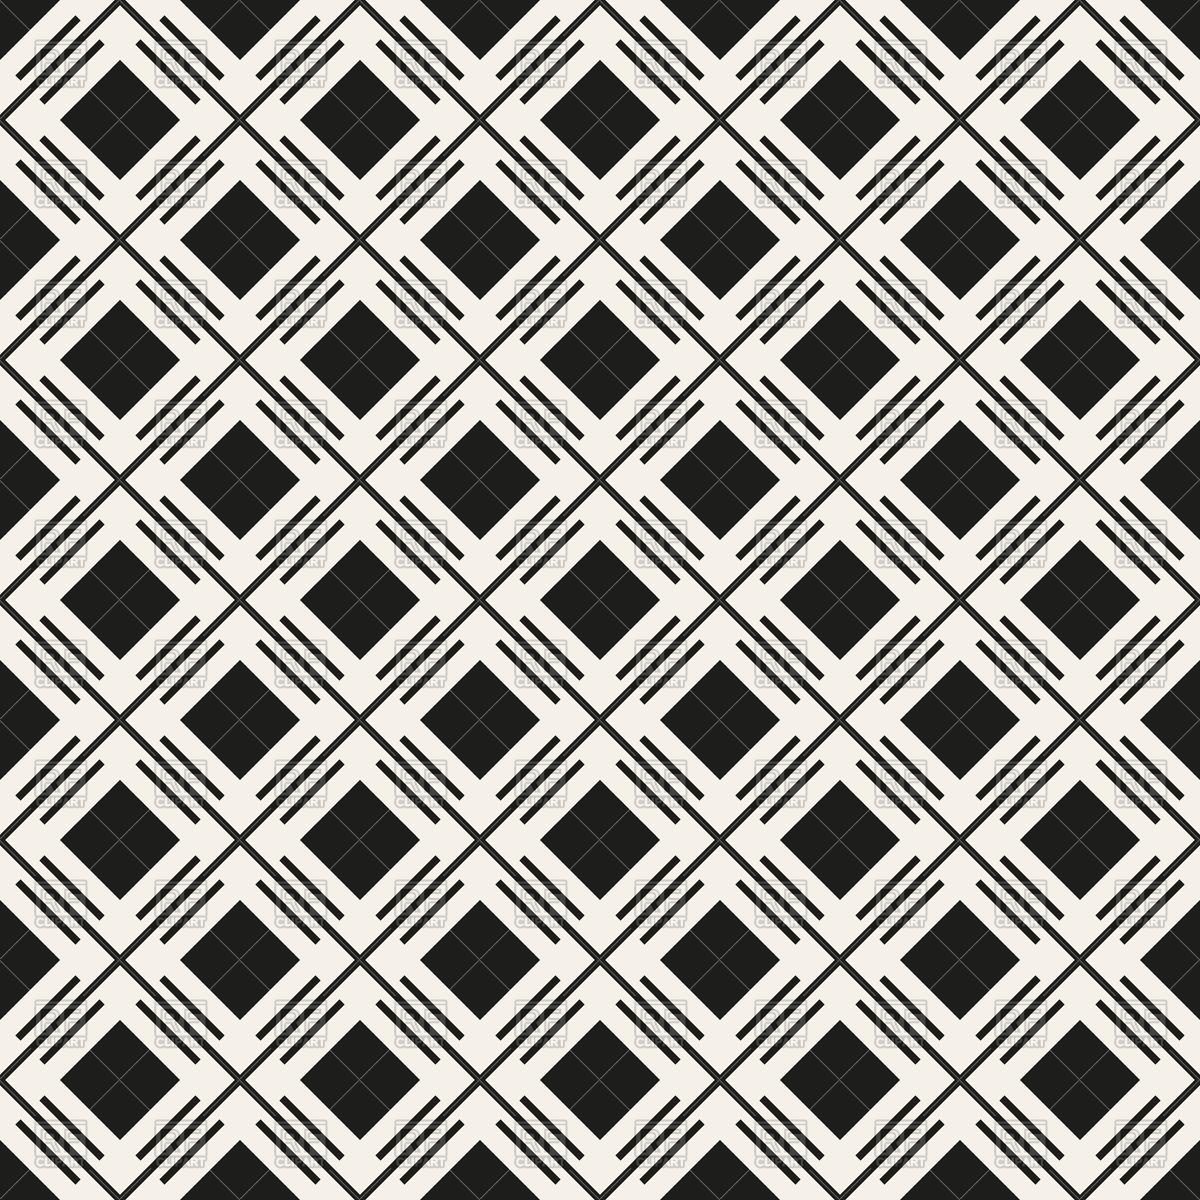 1200x1200 Seamless Geometric Monochrome Pattern With Rhombus Vector Image